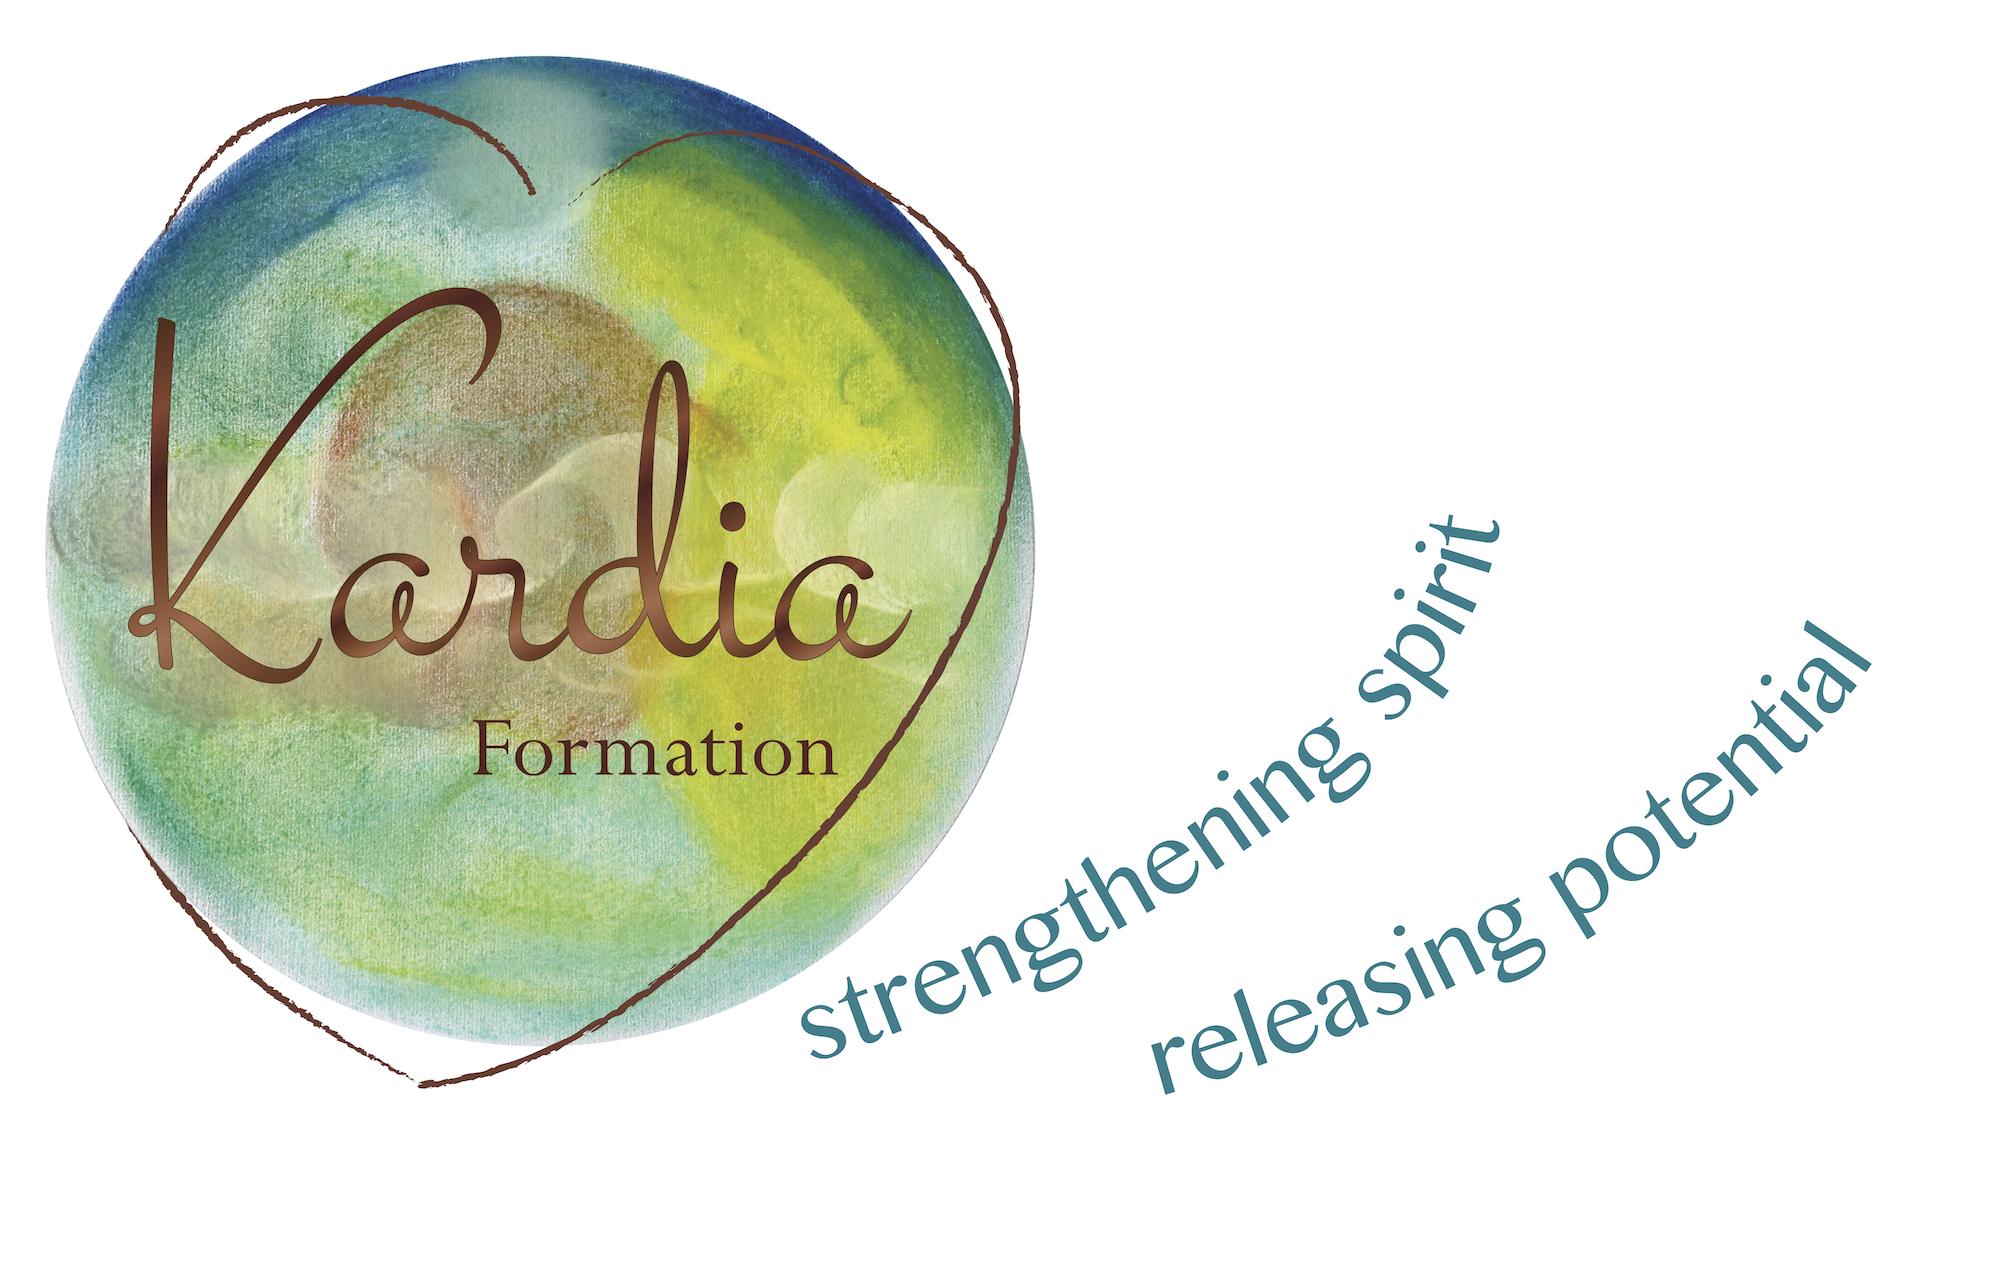 Kardia Formation